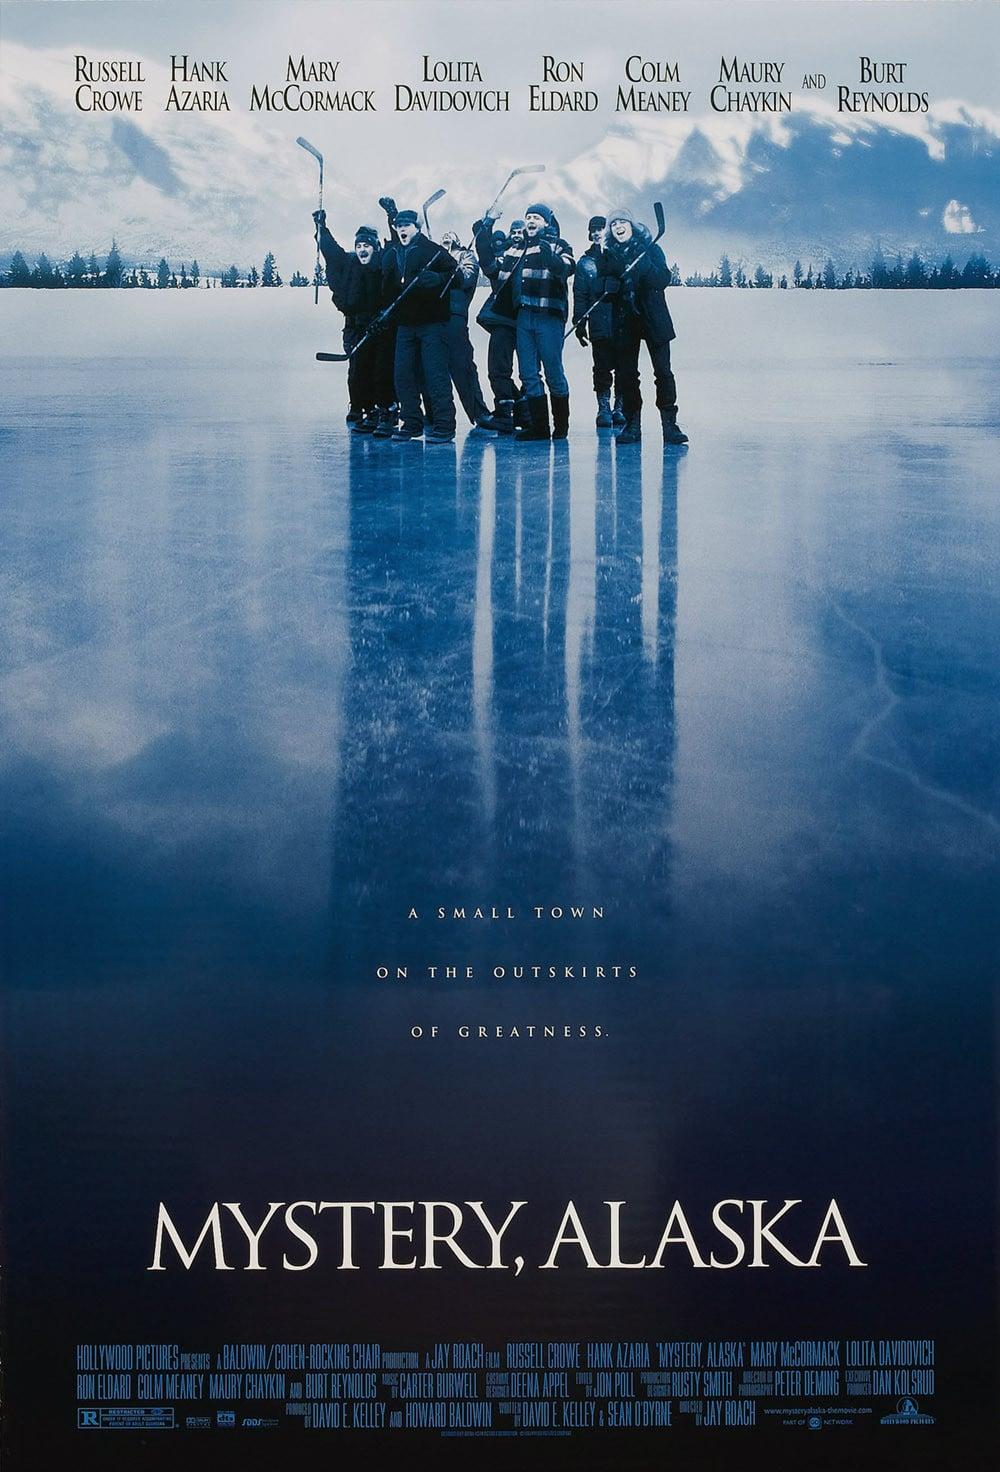 affiche du film Mystery, Alaska